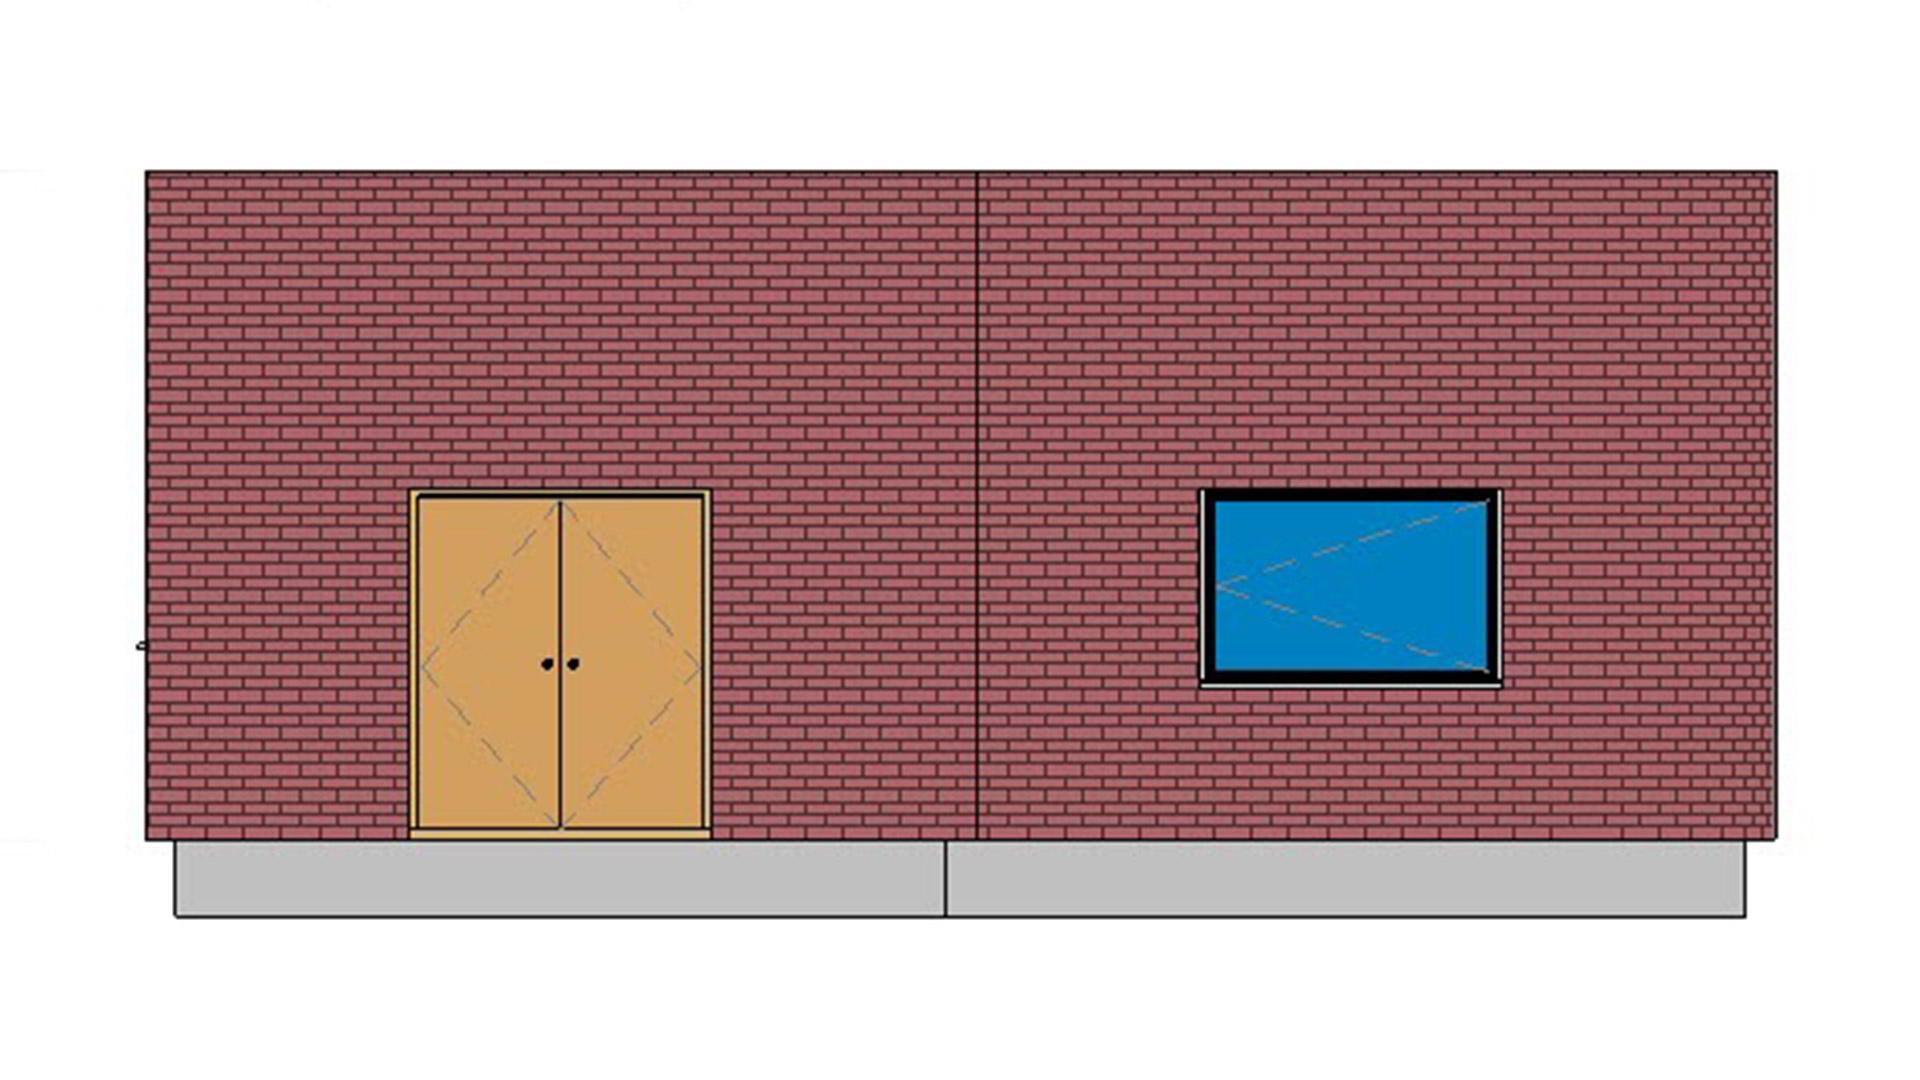 Cert Prep: Revit for Structural Design Professional free download